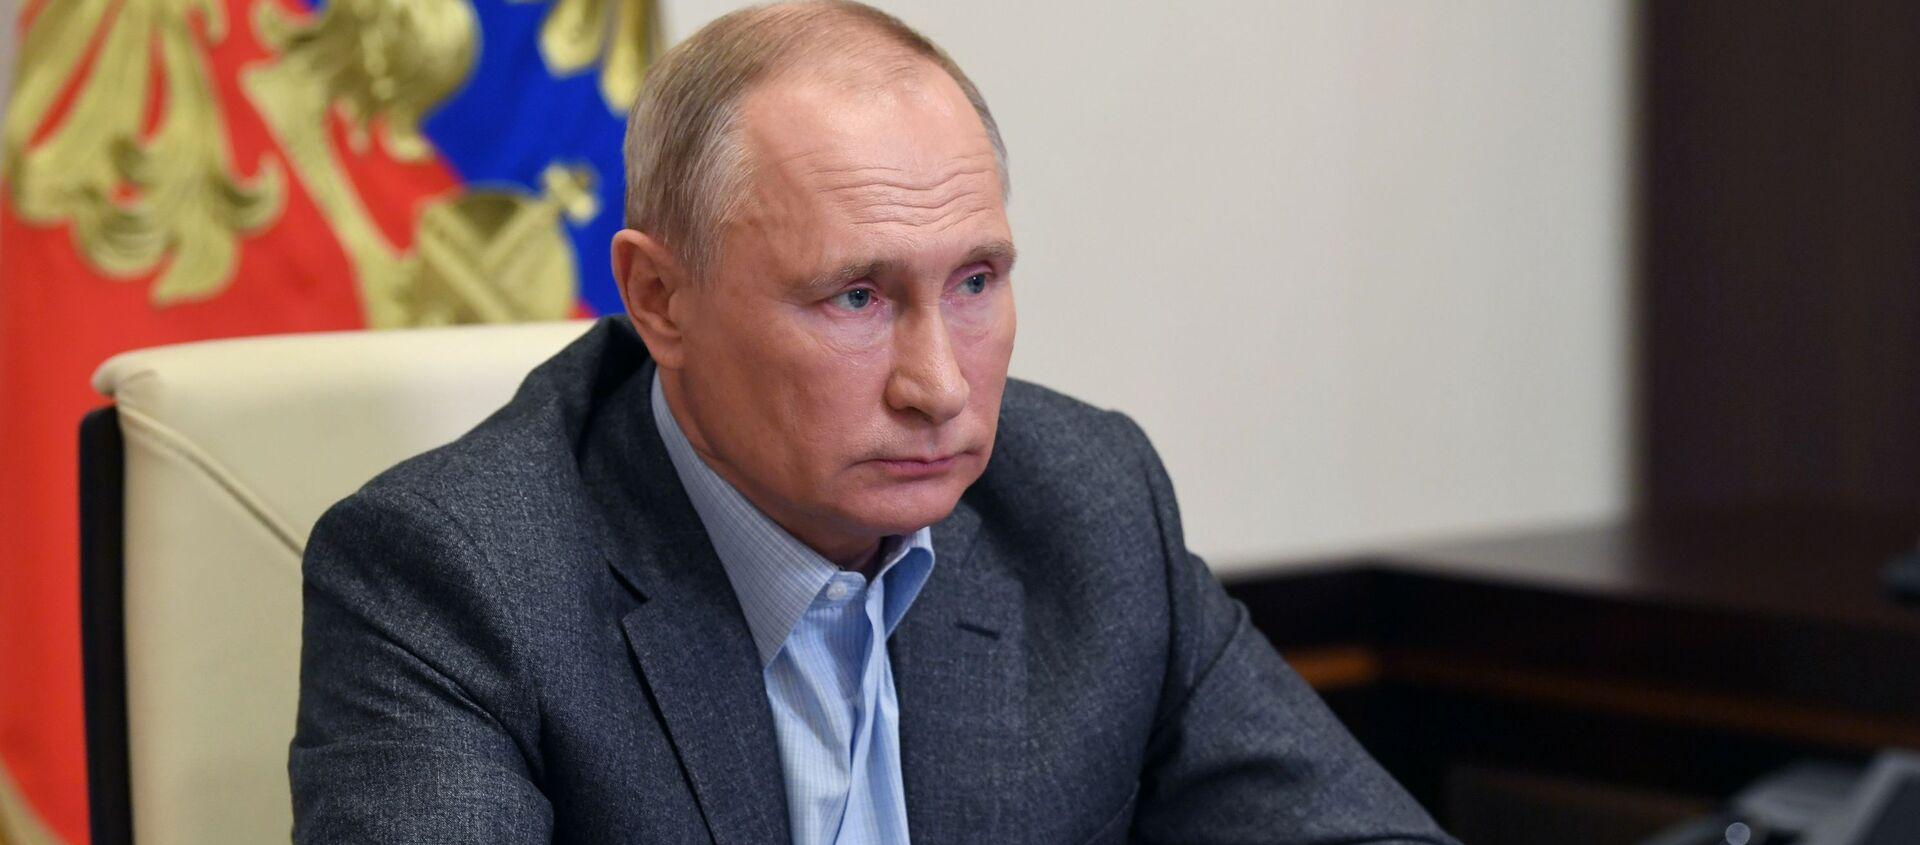 Vladímir Putin, presidente de Rusia - Sputnik Mundo, 1920, 08.12.2020